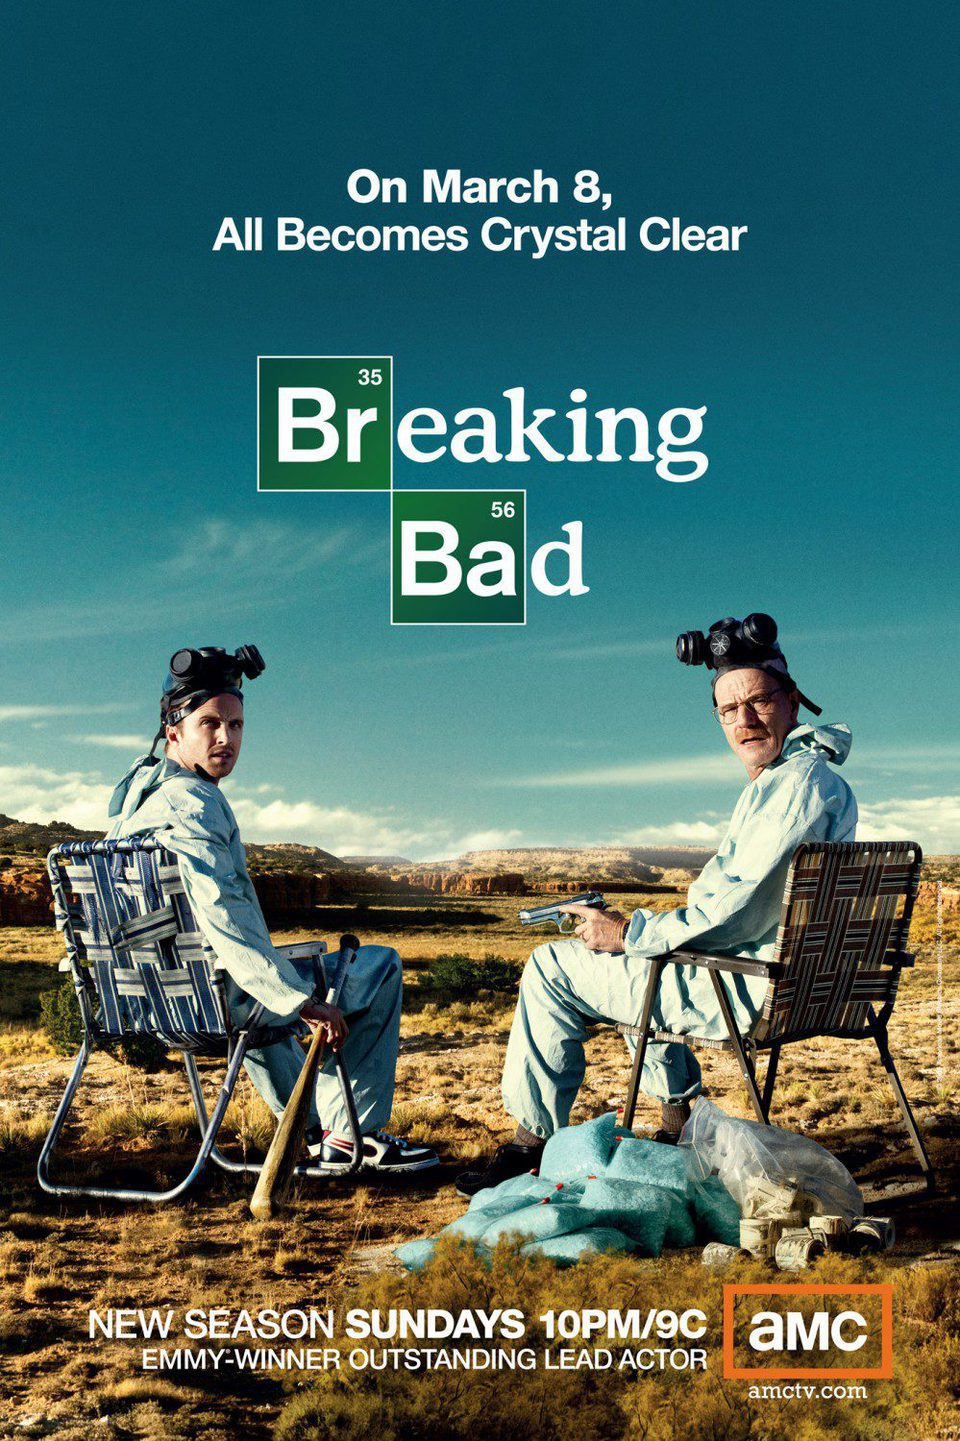 Cartel Temporada 2 de 'Breaking Bad'